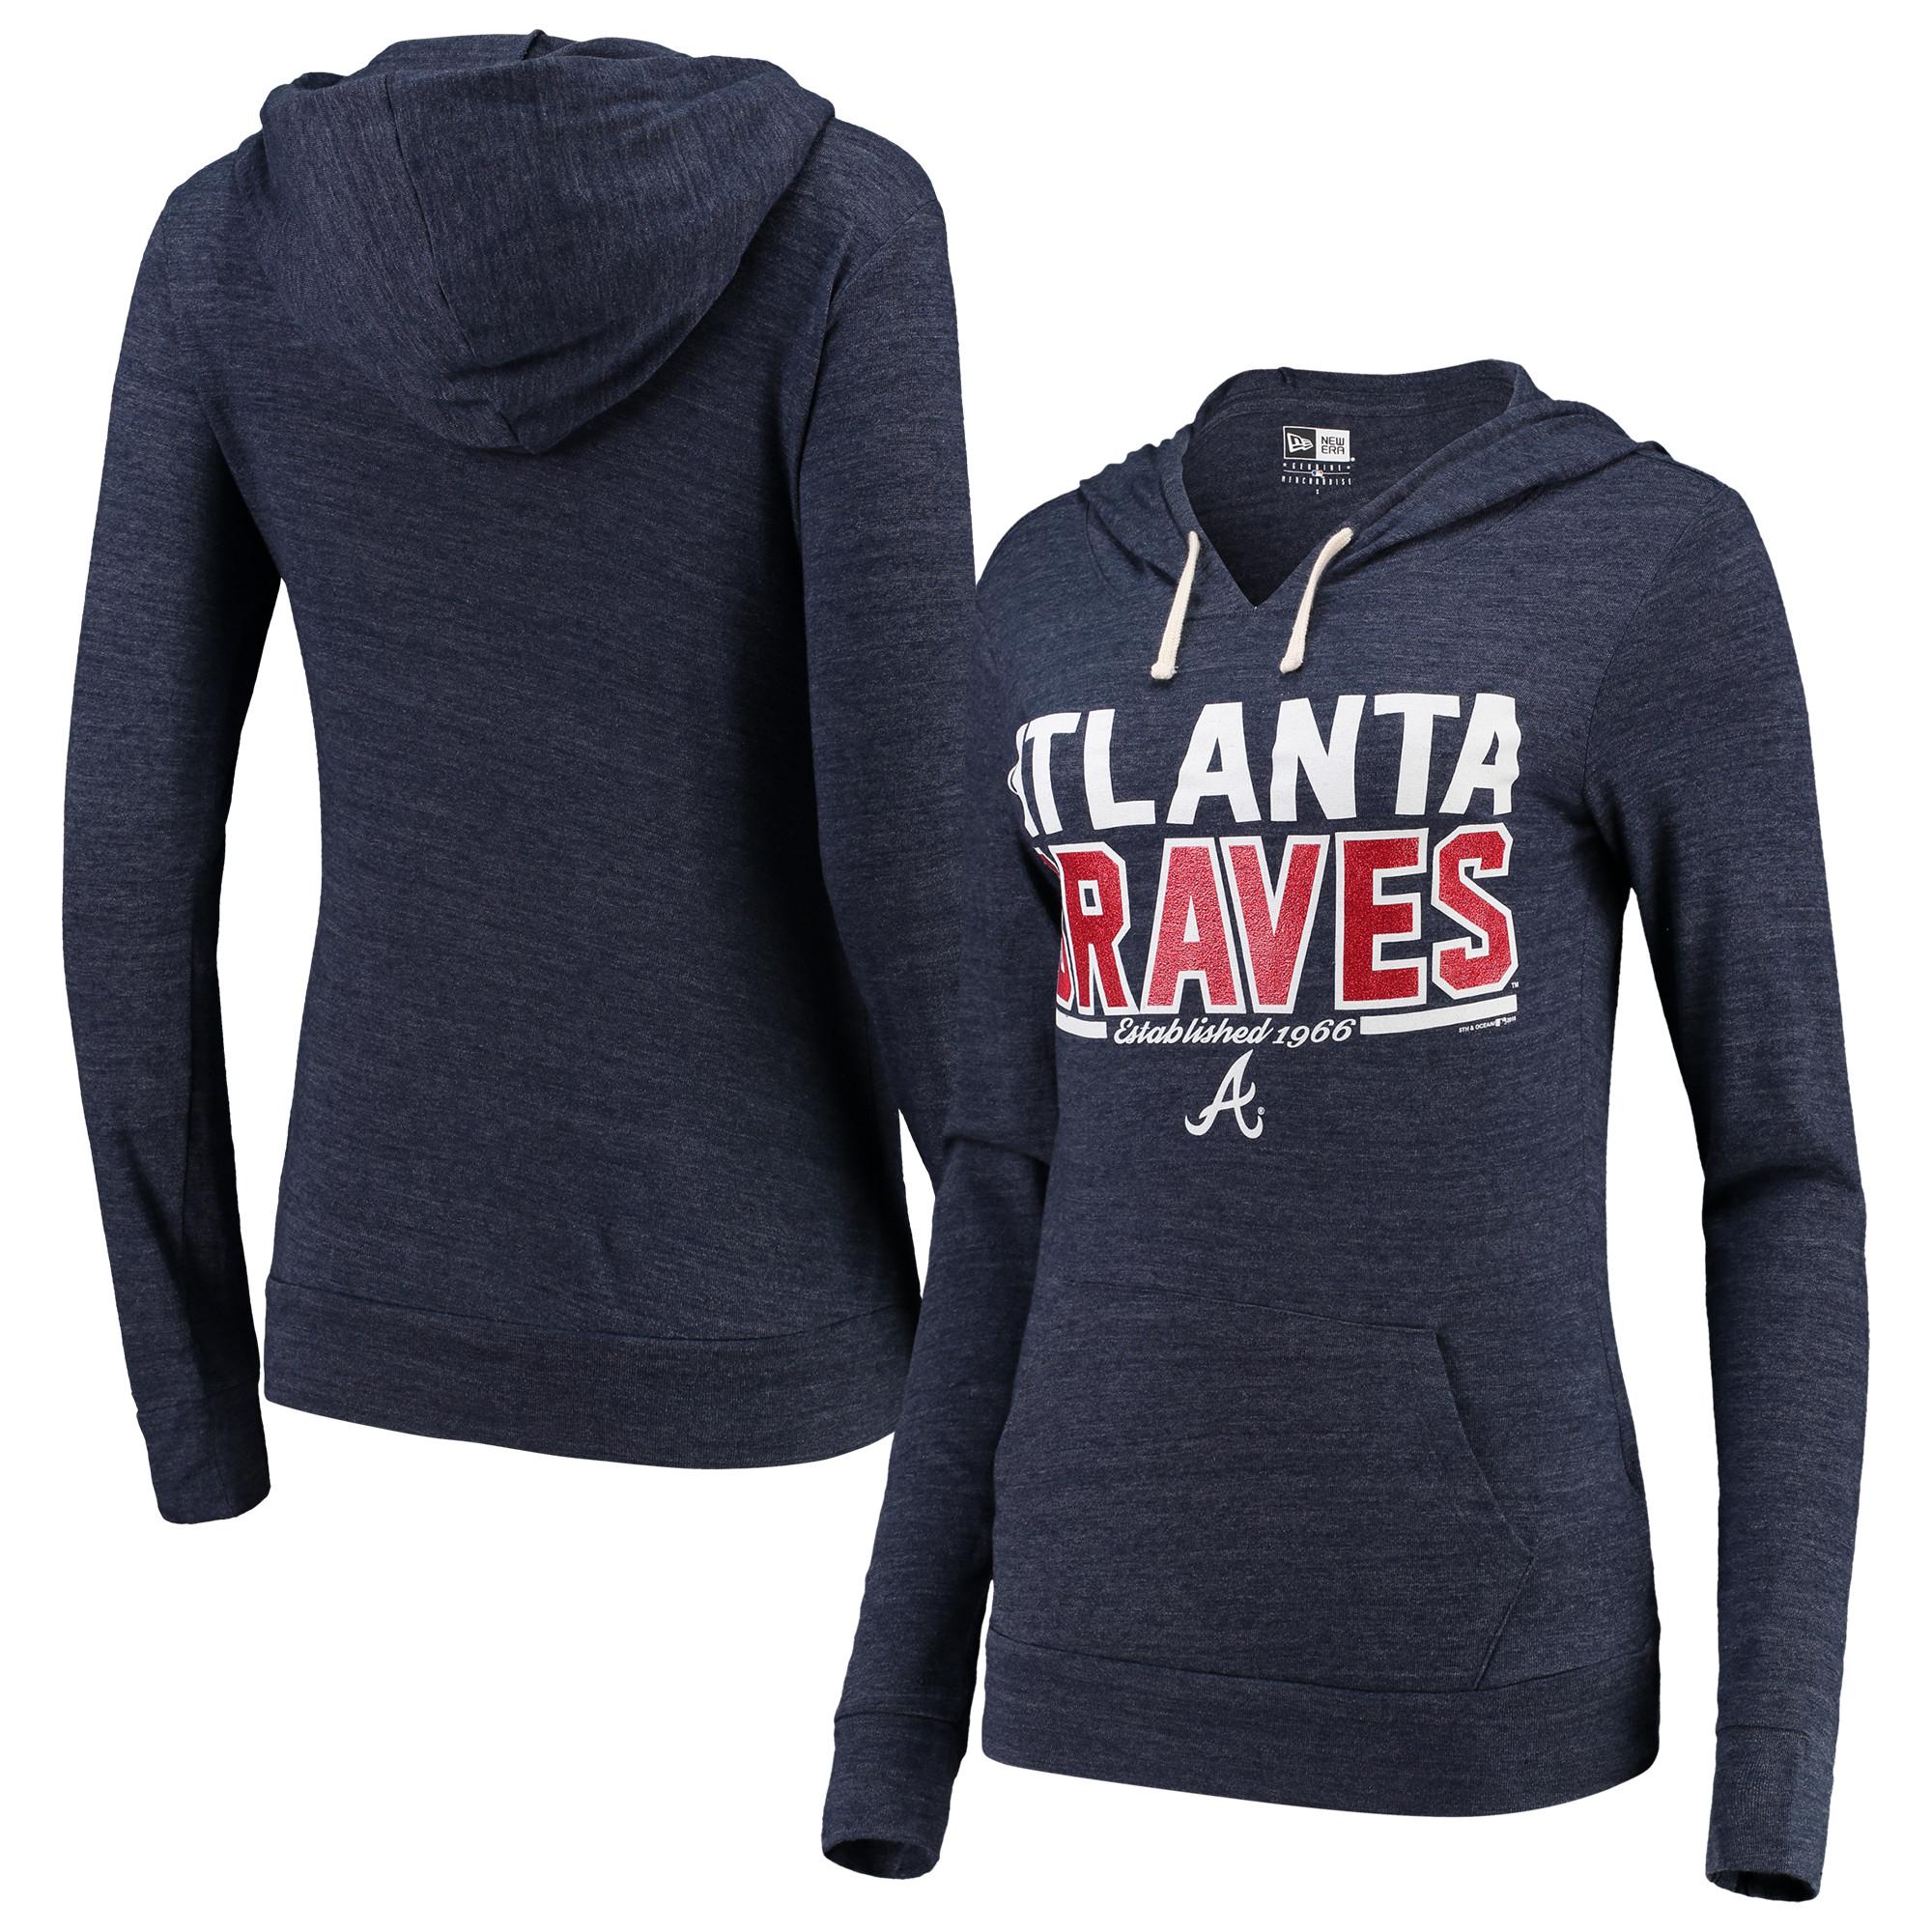 Atlanta Braves 5th & Ocean by New Era Women's Jersey Tri-Blend Pullover Hoodie - Heathered Navy